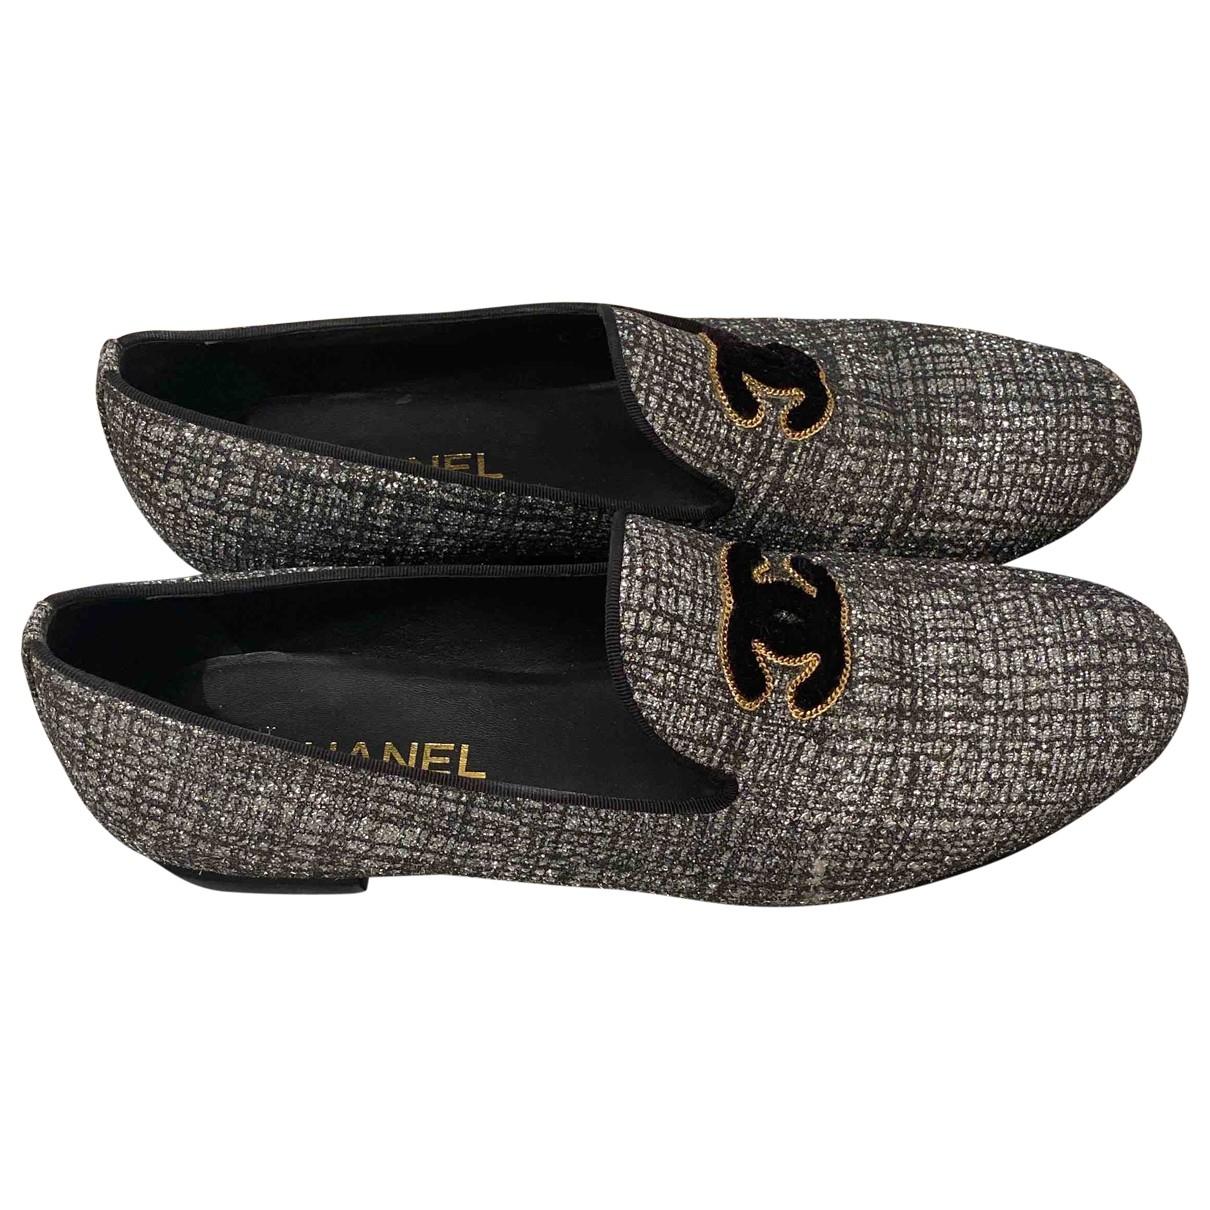 Mocasines Tweed Chanel